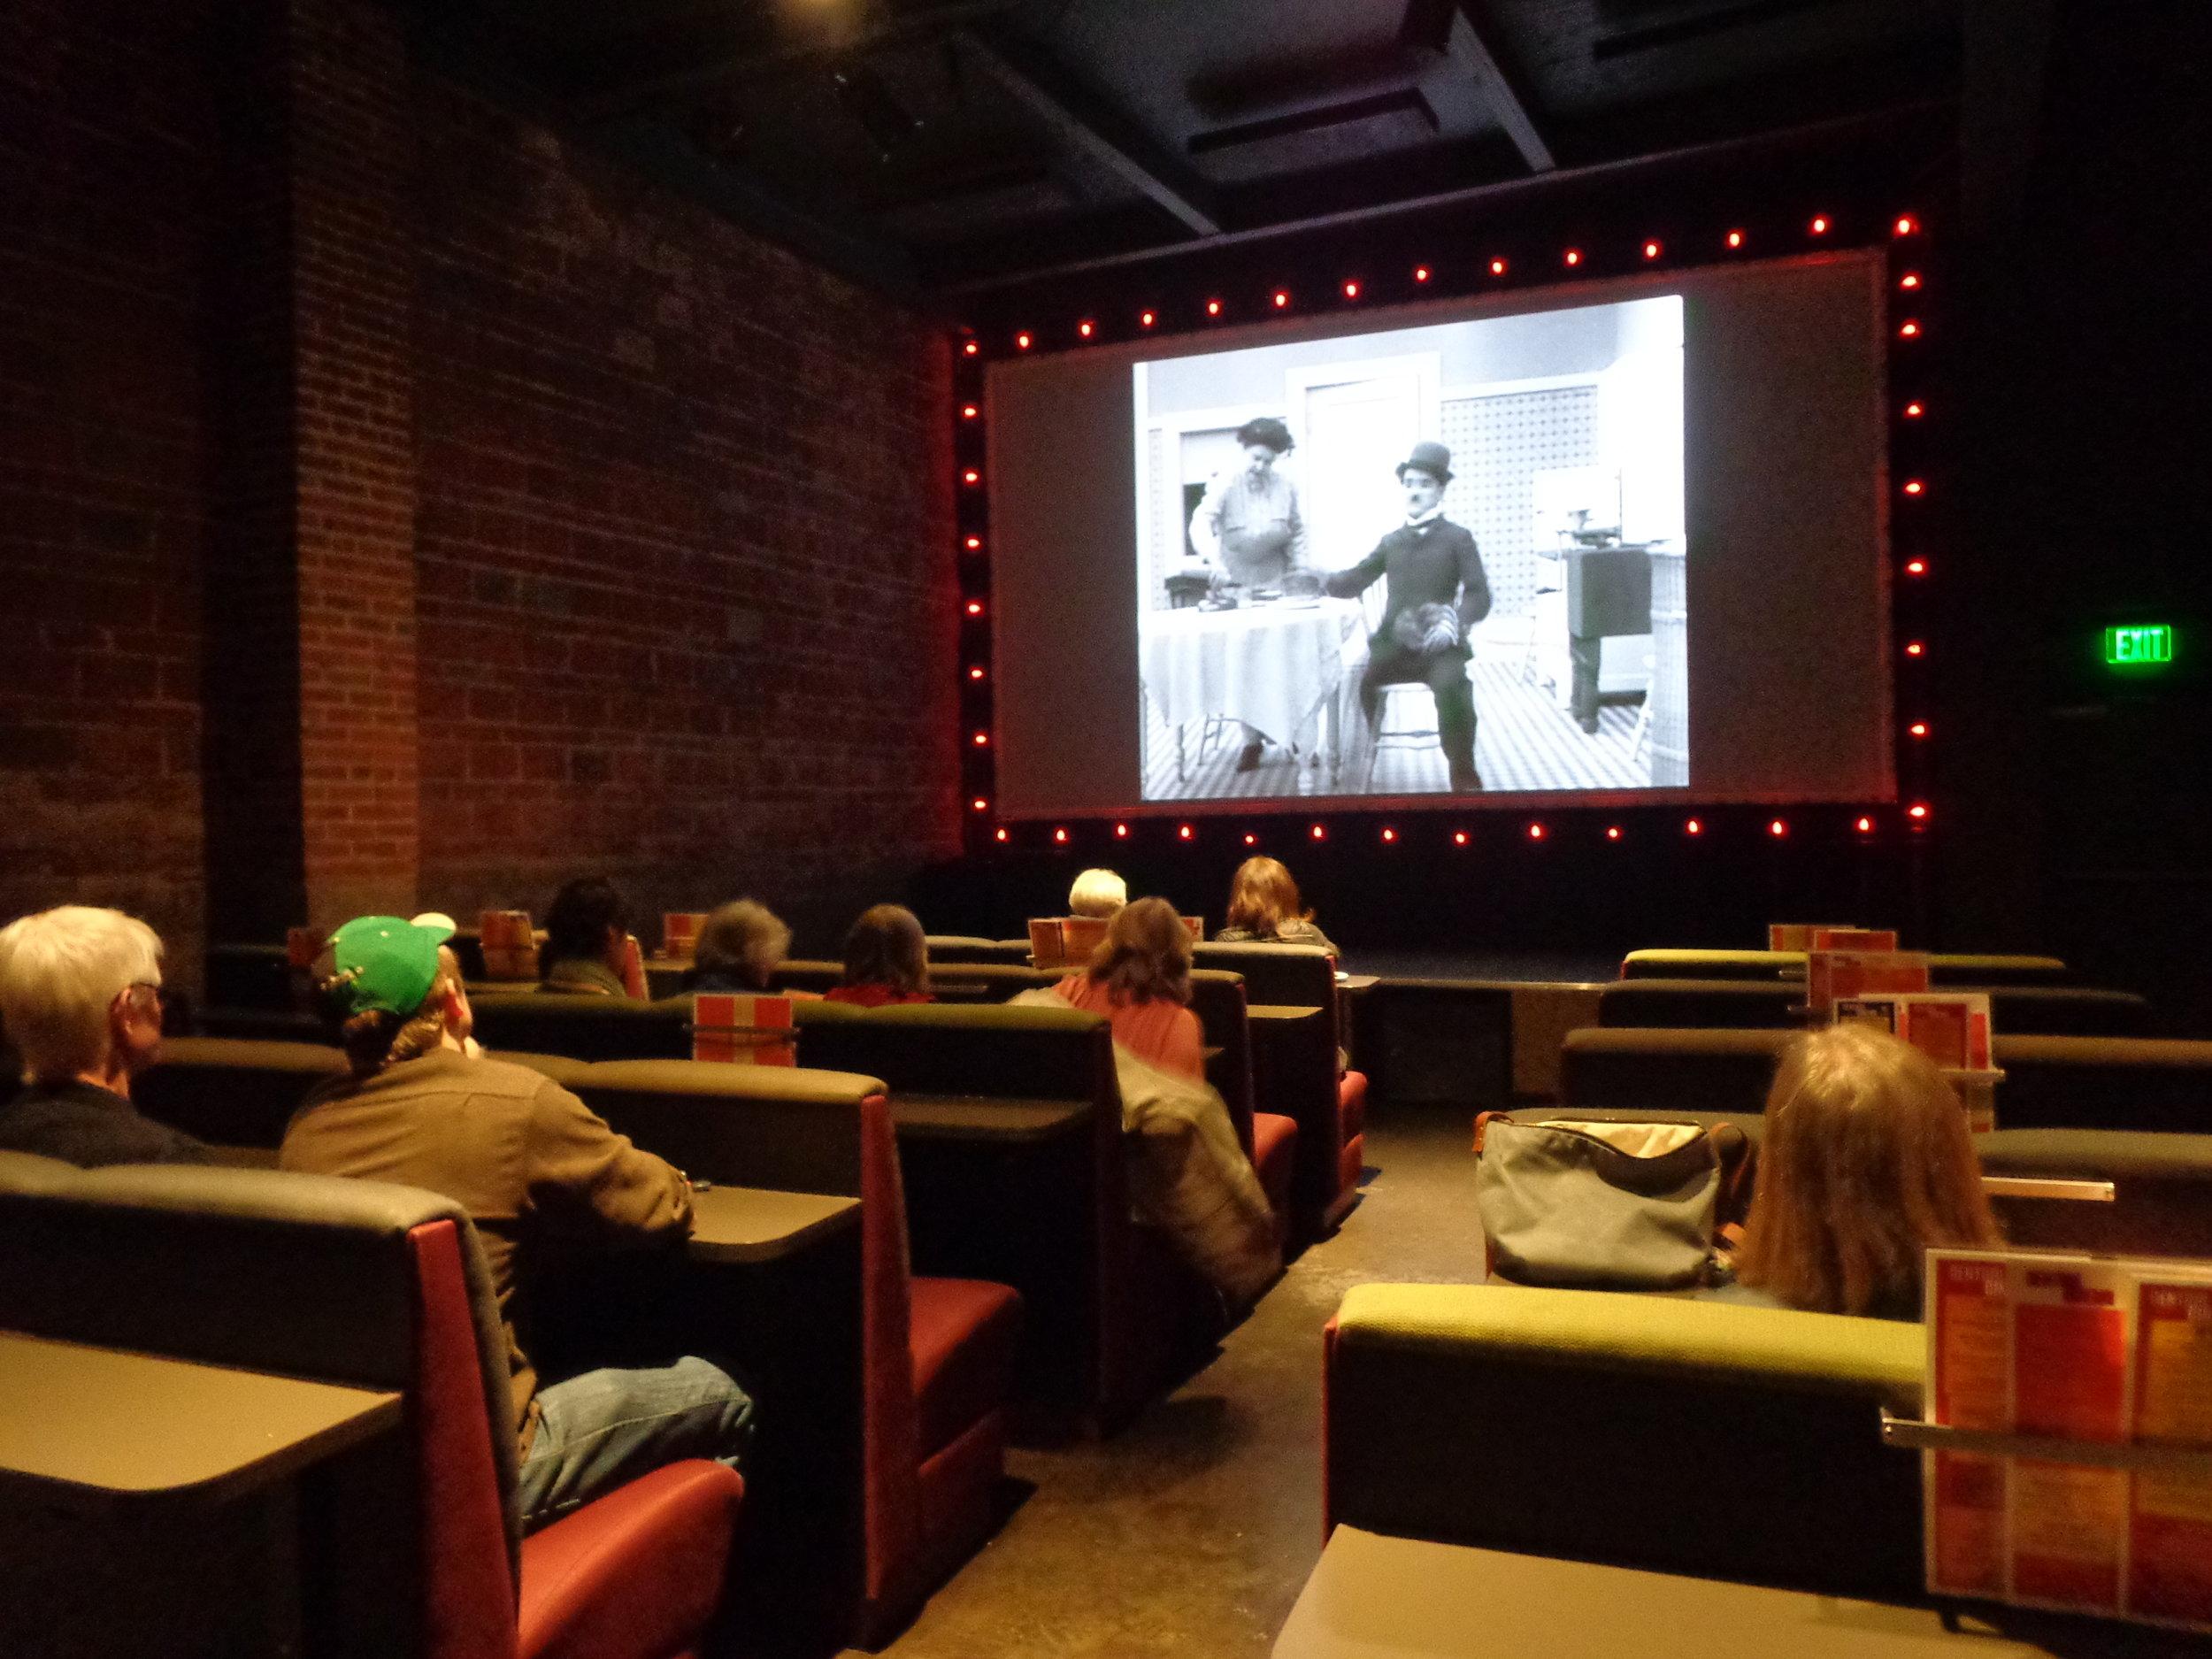 Central Cinema and April 9th 001.JPG